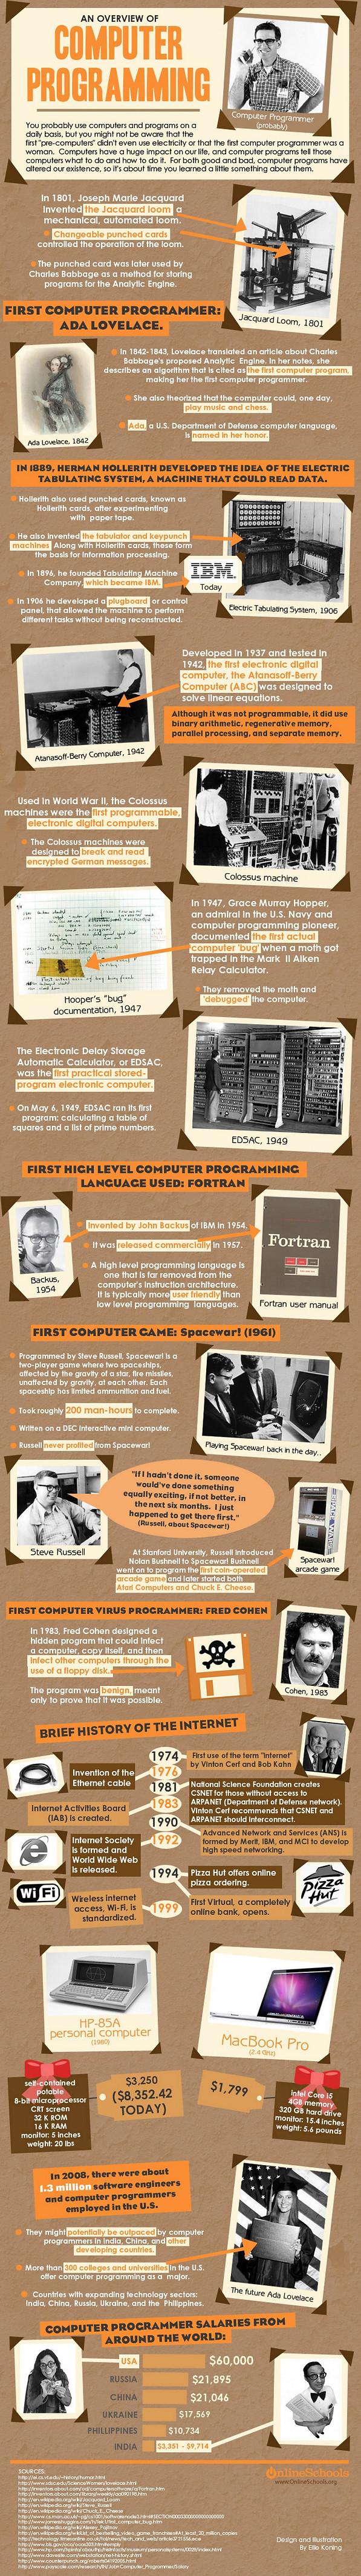 history of computer programming.jpg